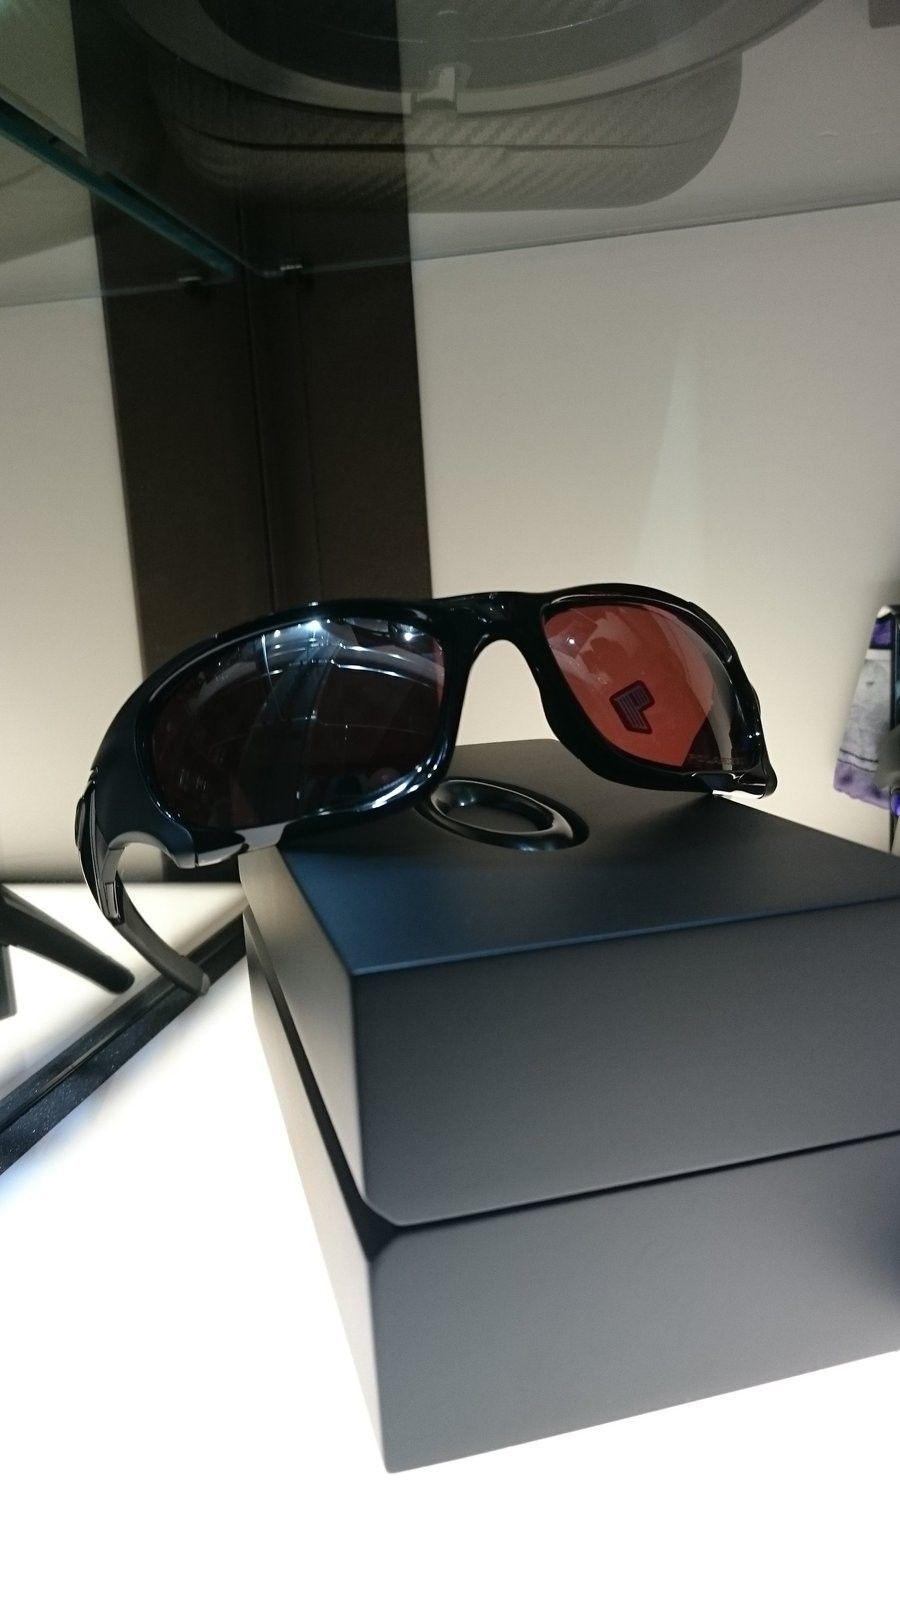 BNIB Pit Boss 2 - Polished Black with VR28 BIP - DSC_0017.JPG